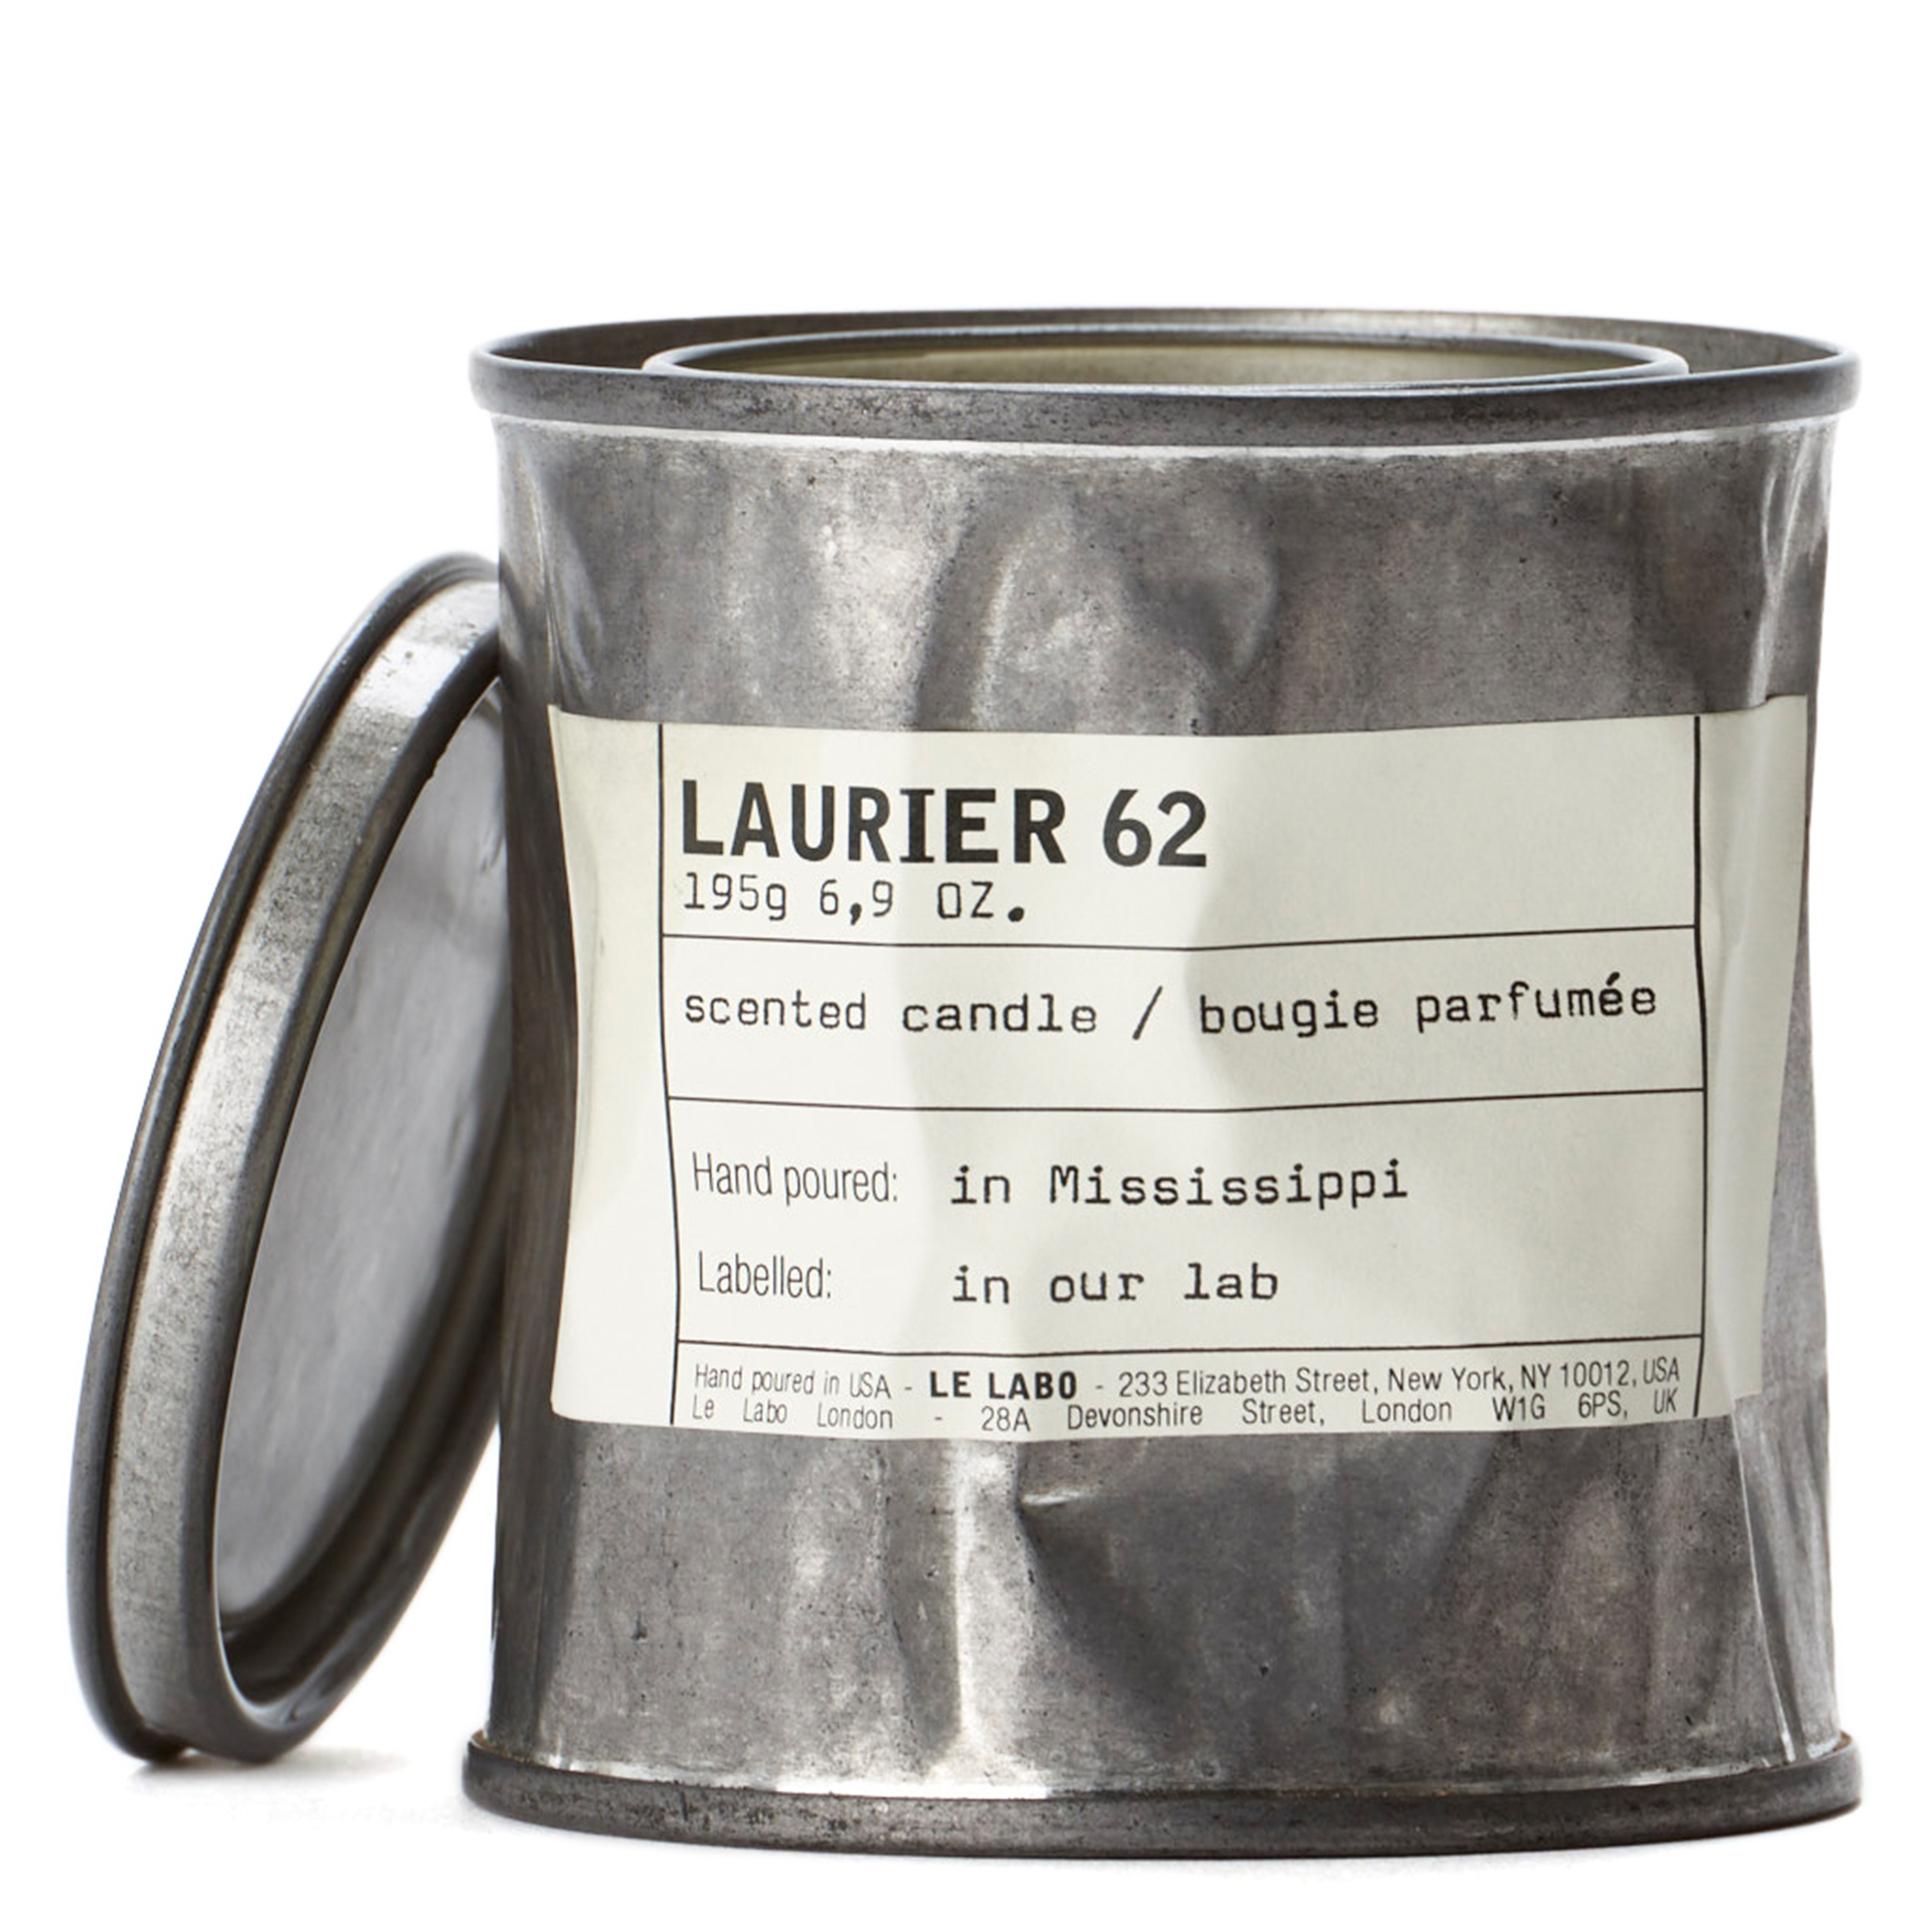 Laurier 62 - Vintage Candle